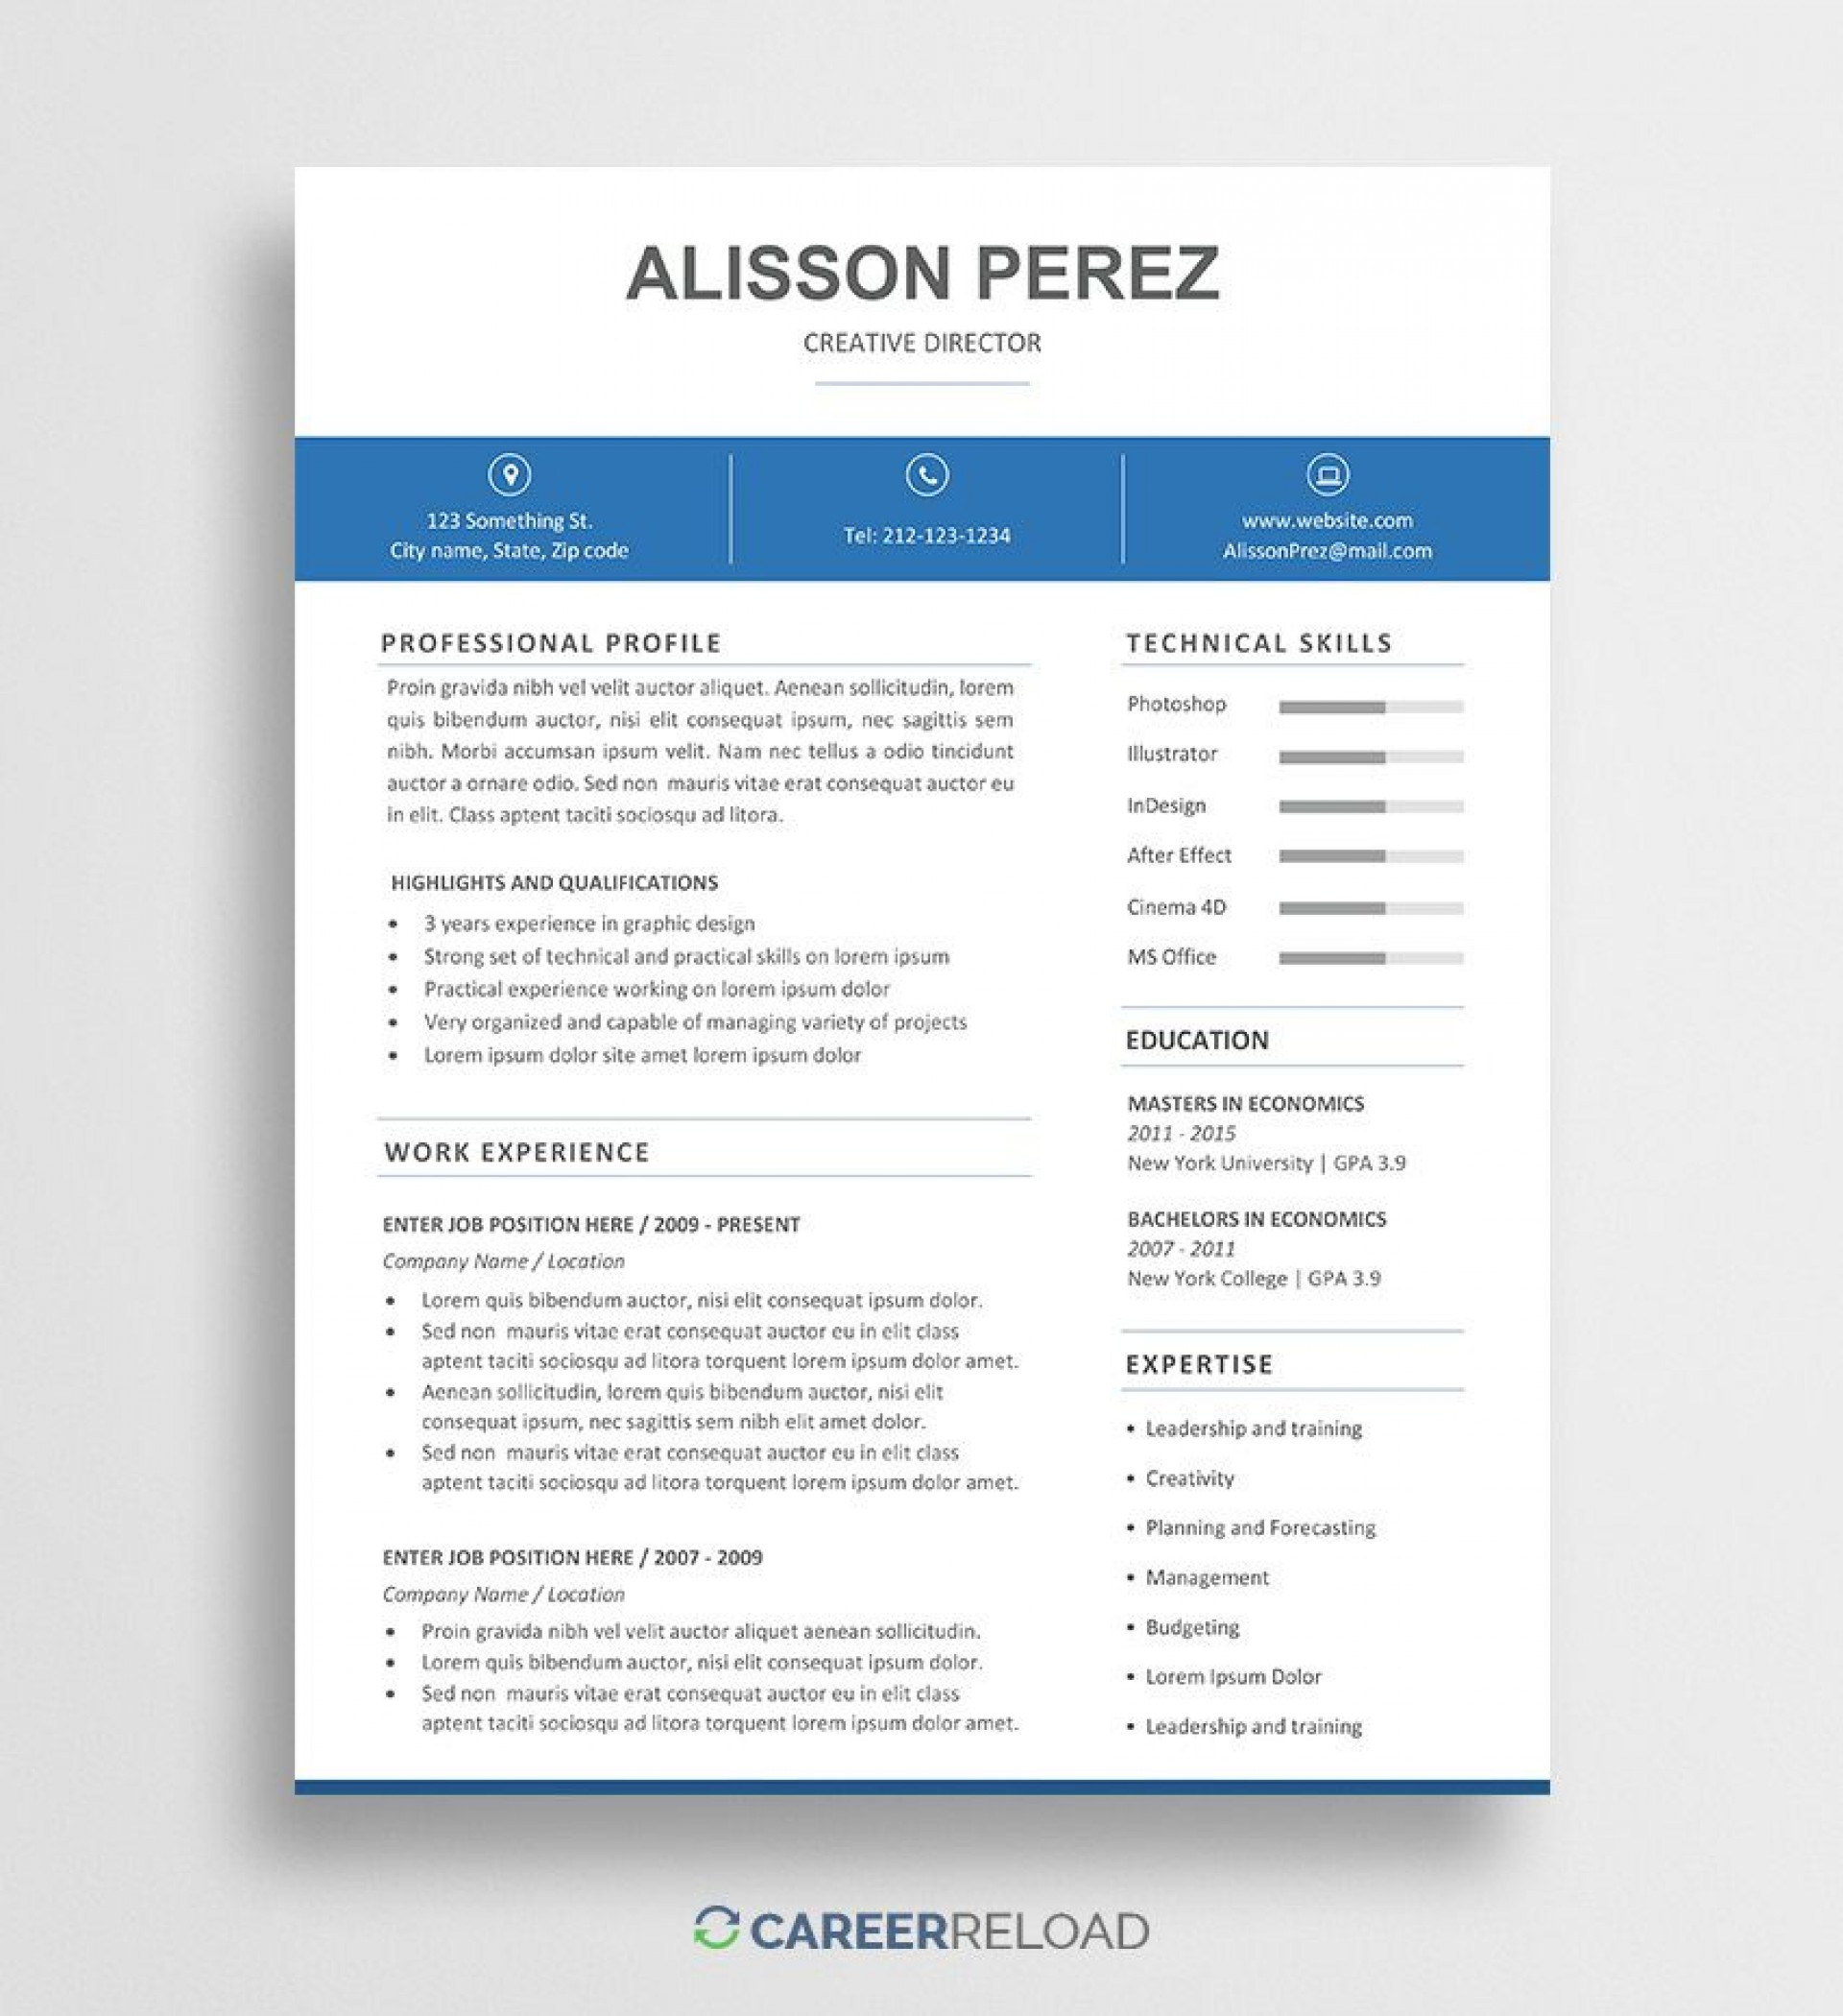 008 Phenomenal Free Resume Template Microsoft Office Word 2007 Image 1920